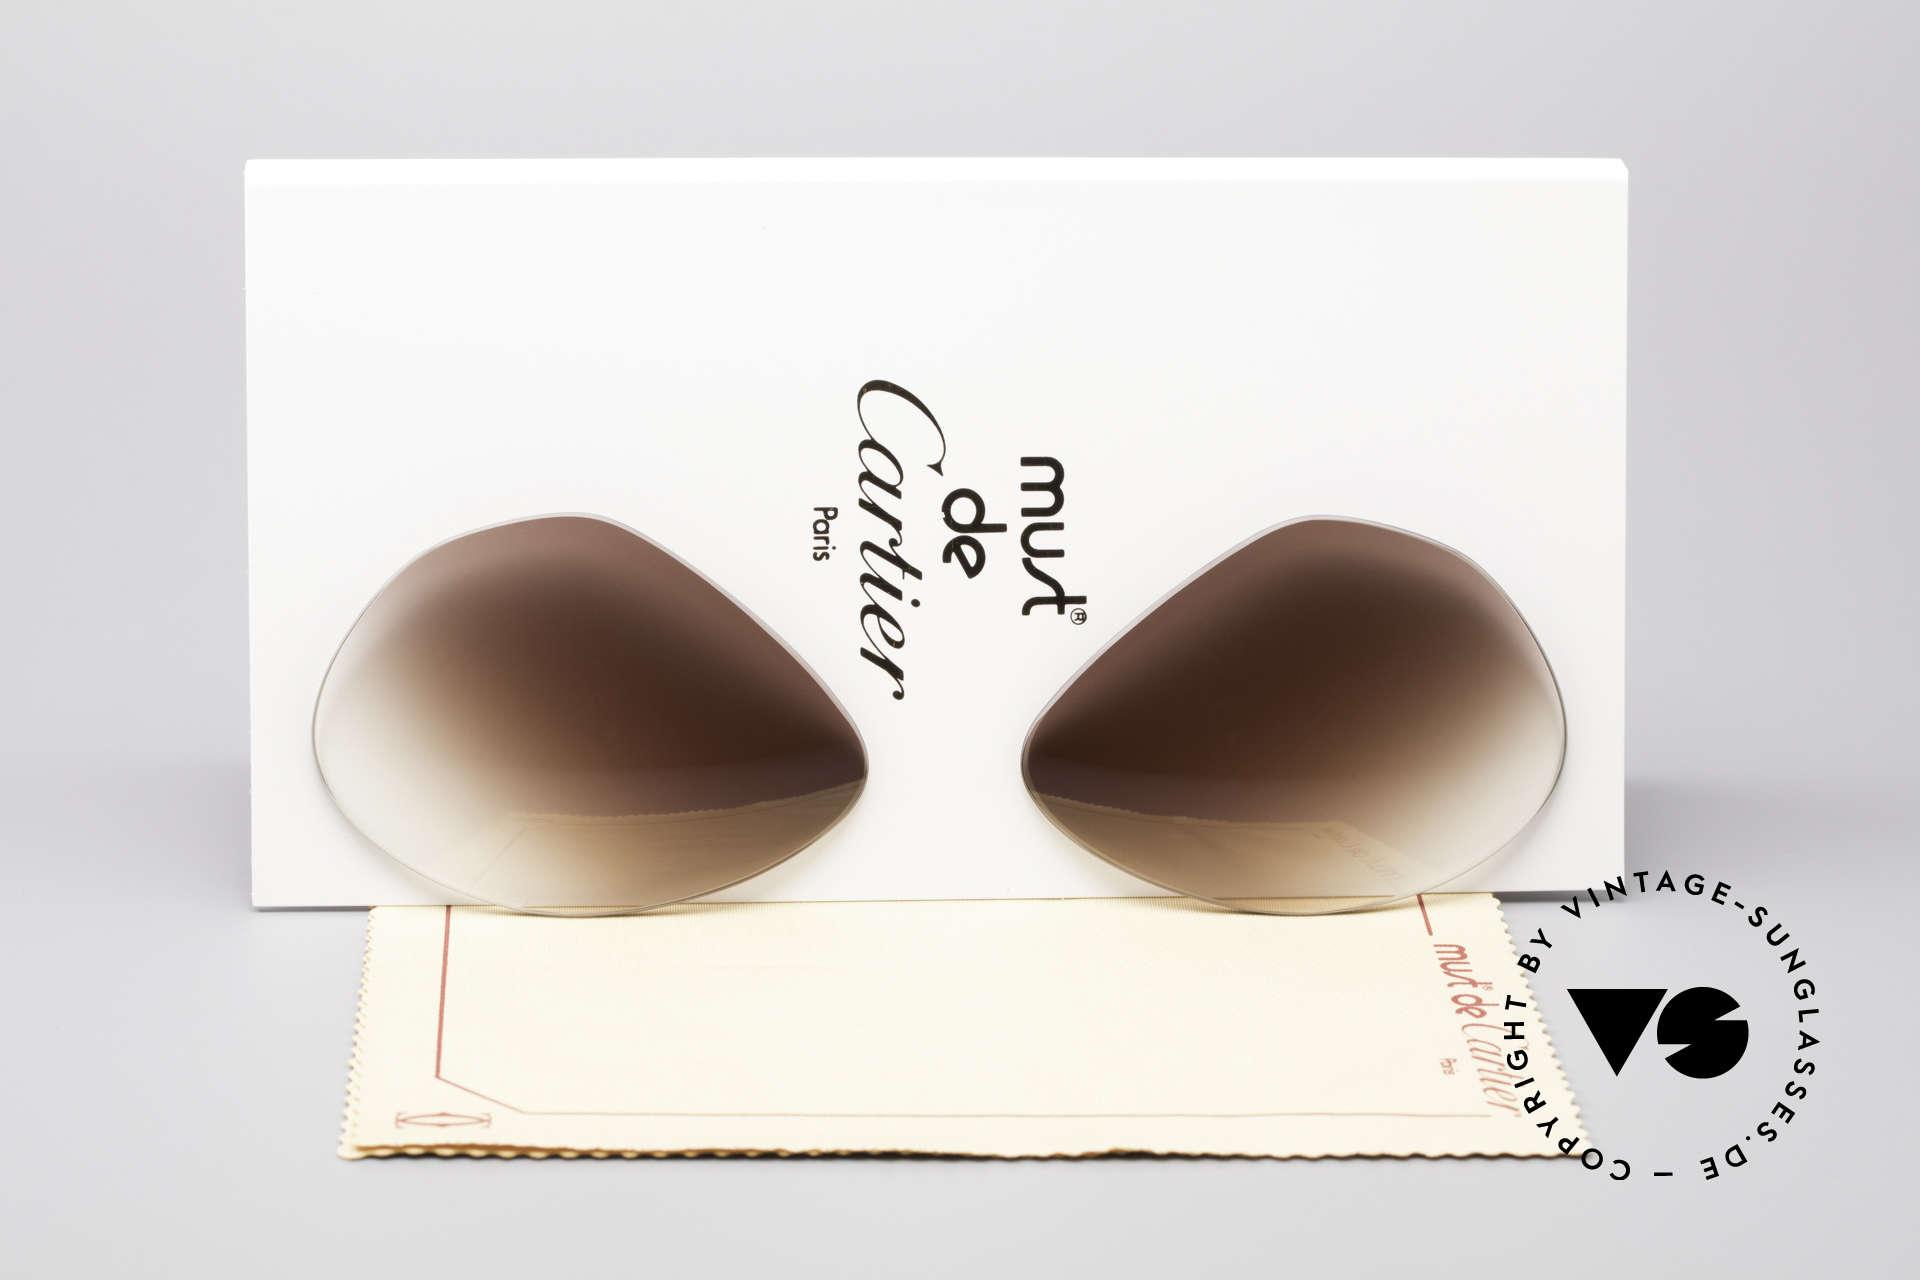 Cartier Vendome Lenses - M Sun Lenses Brown Gradient, replacement lenses for Cartier mod. Vendome 59mm size, Made for Men and Women